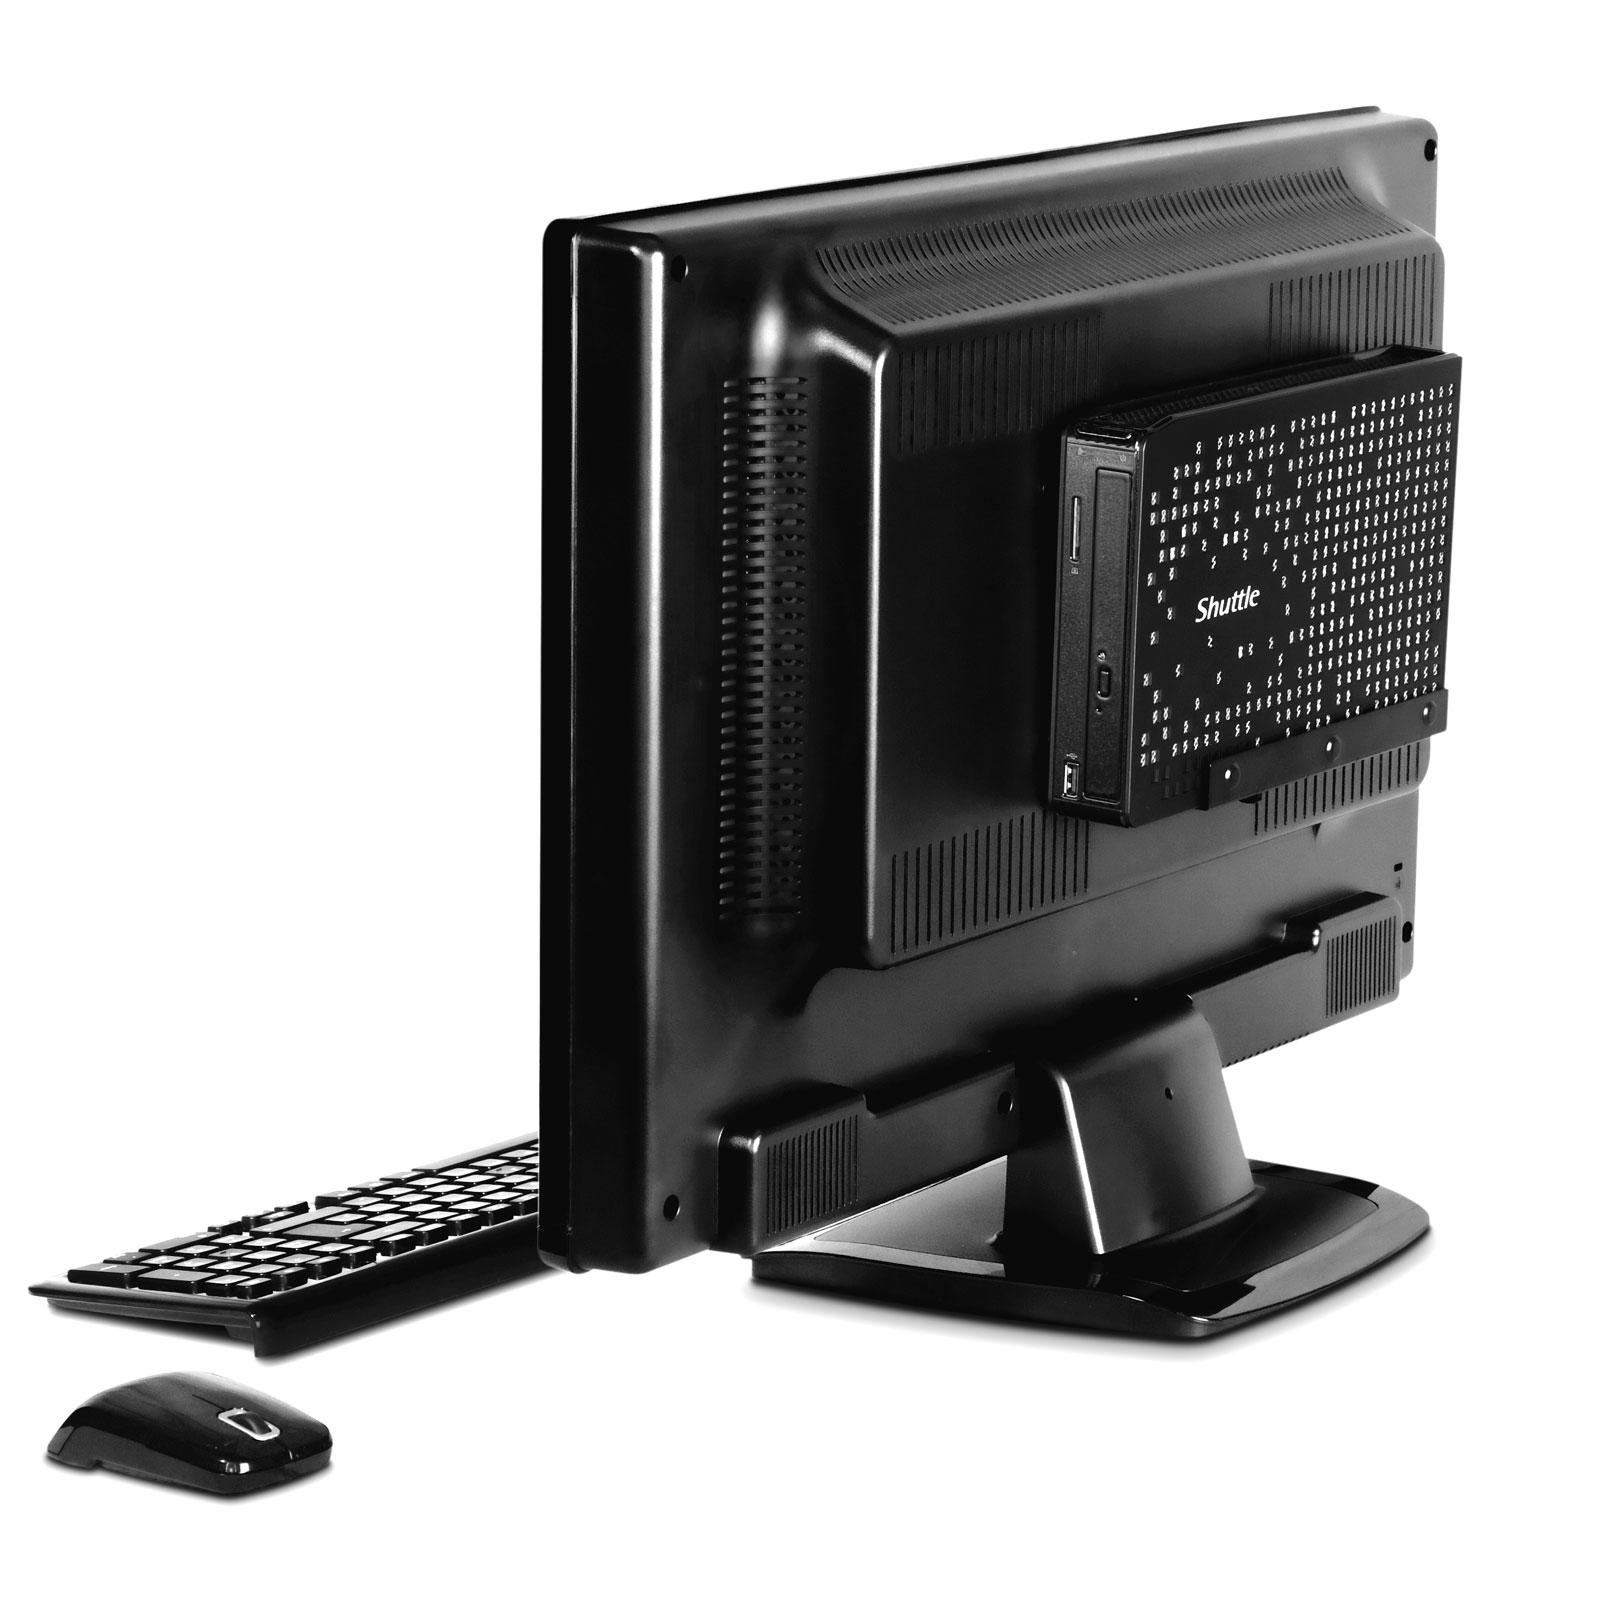 shuttle xs35v4 mini barebone xs35v4 achat vente barebone pc sur. Black Bedroom Furniture Sets. Home Design Ideas